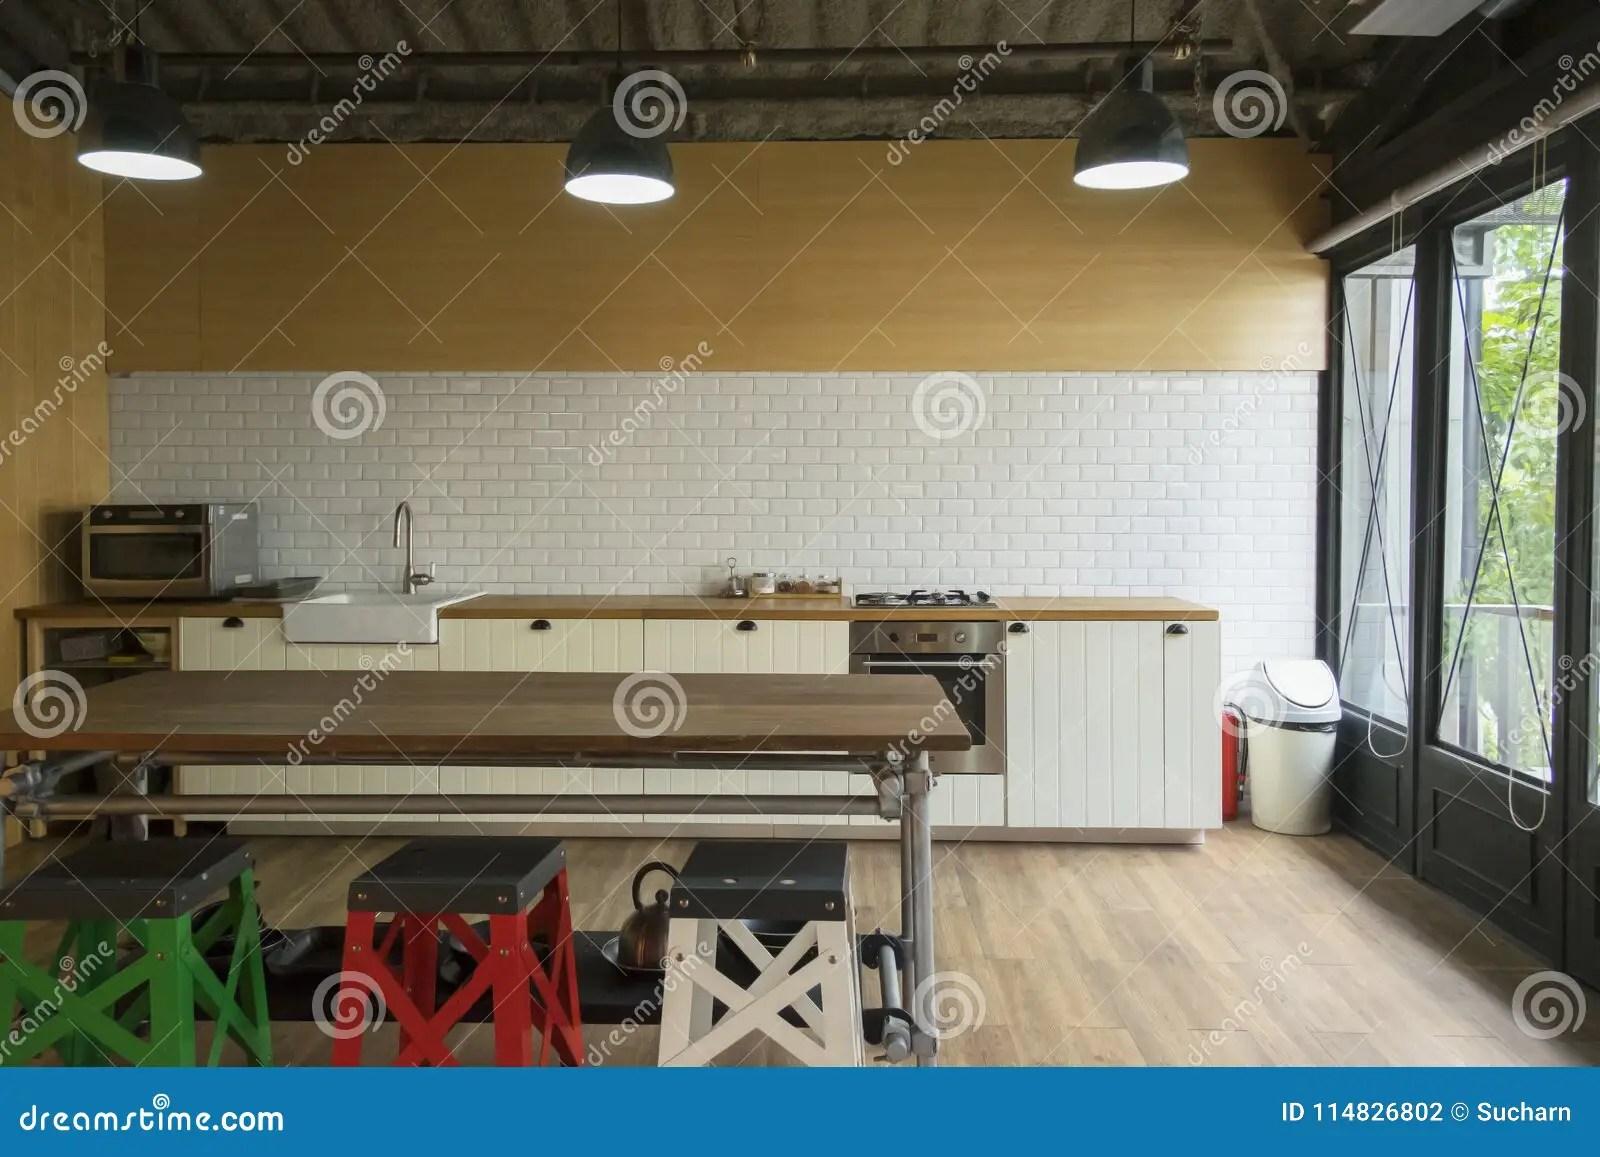 corner hutch kitchen soap dispenser parts 白色厨房的角落厨房是与丝毫的装饰库存照片 图片包括有任何地方 详细 白色厨房的角落厨房是与丝毫的装饰